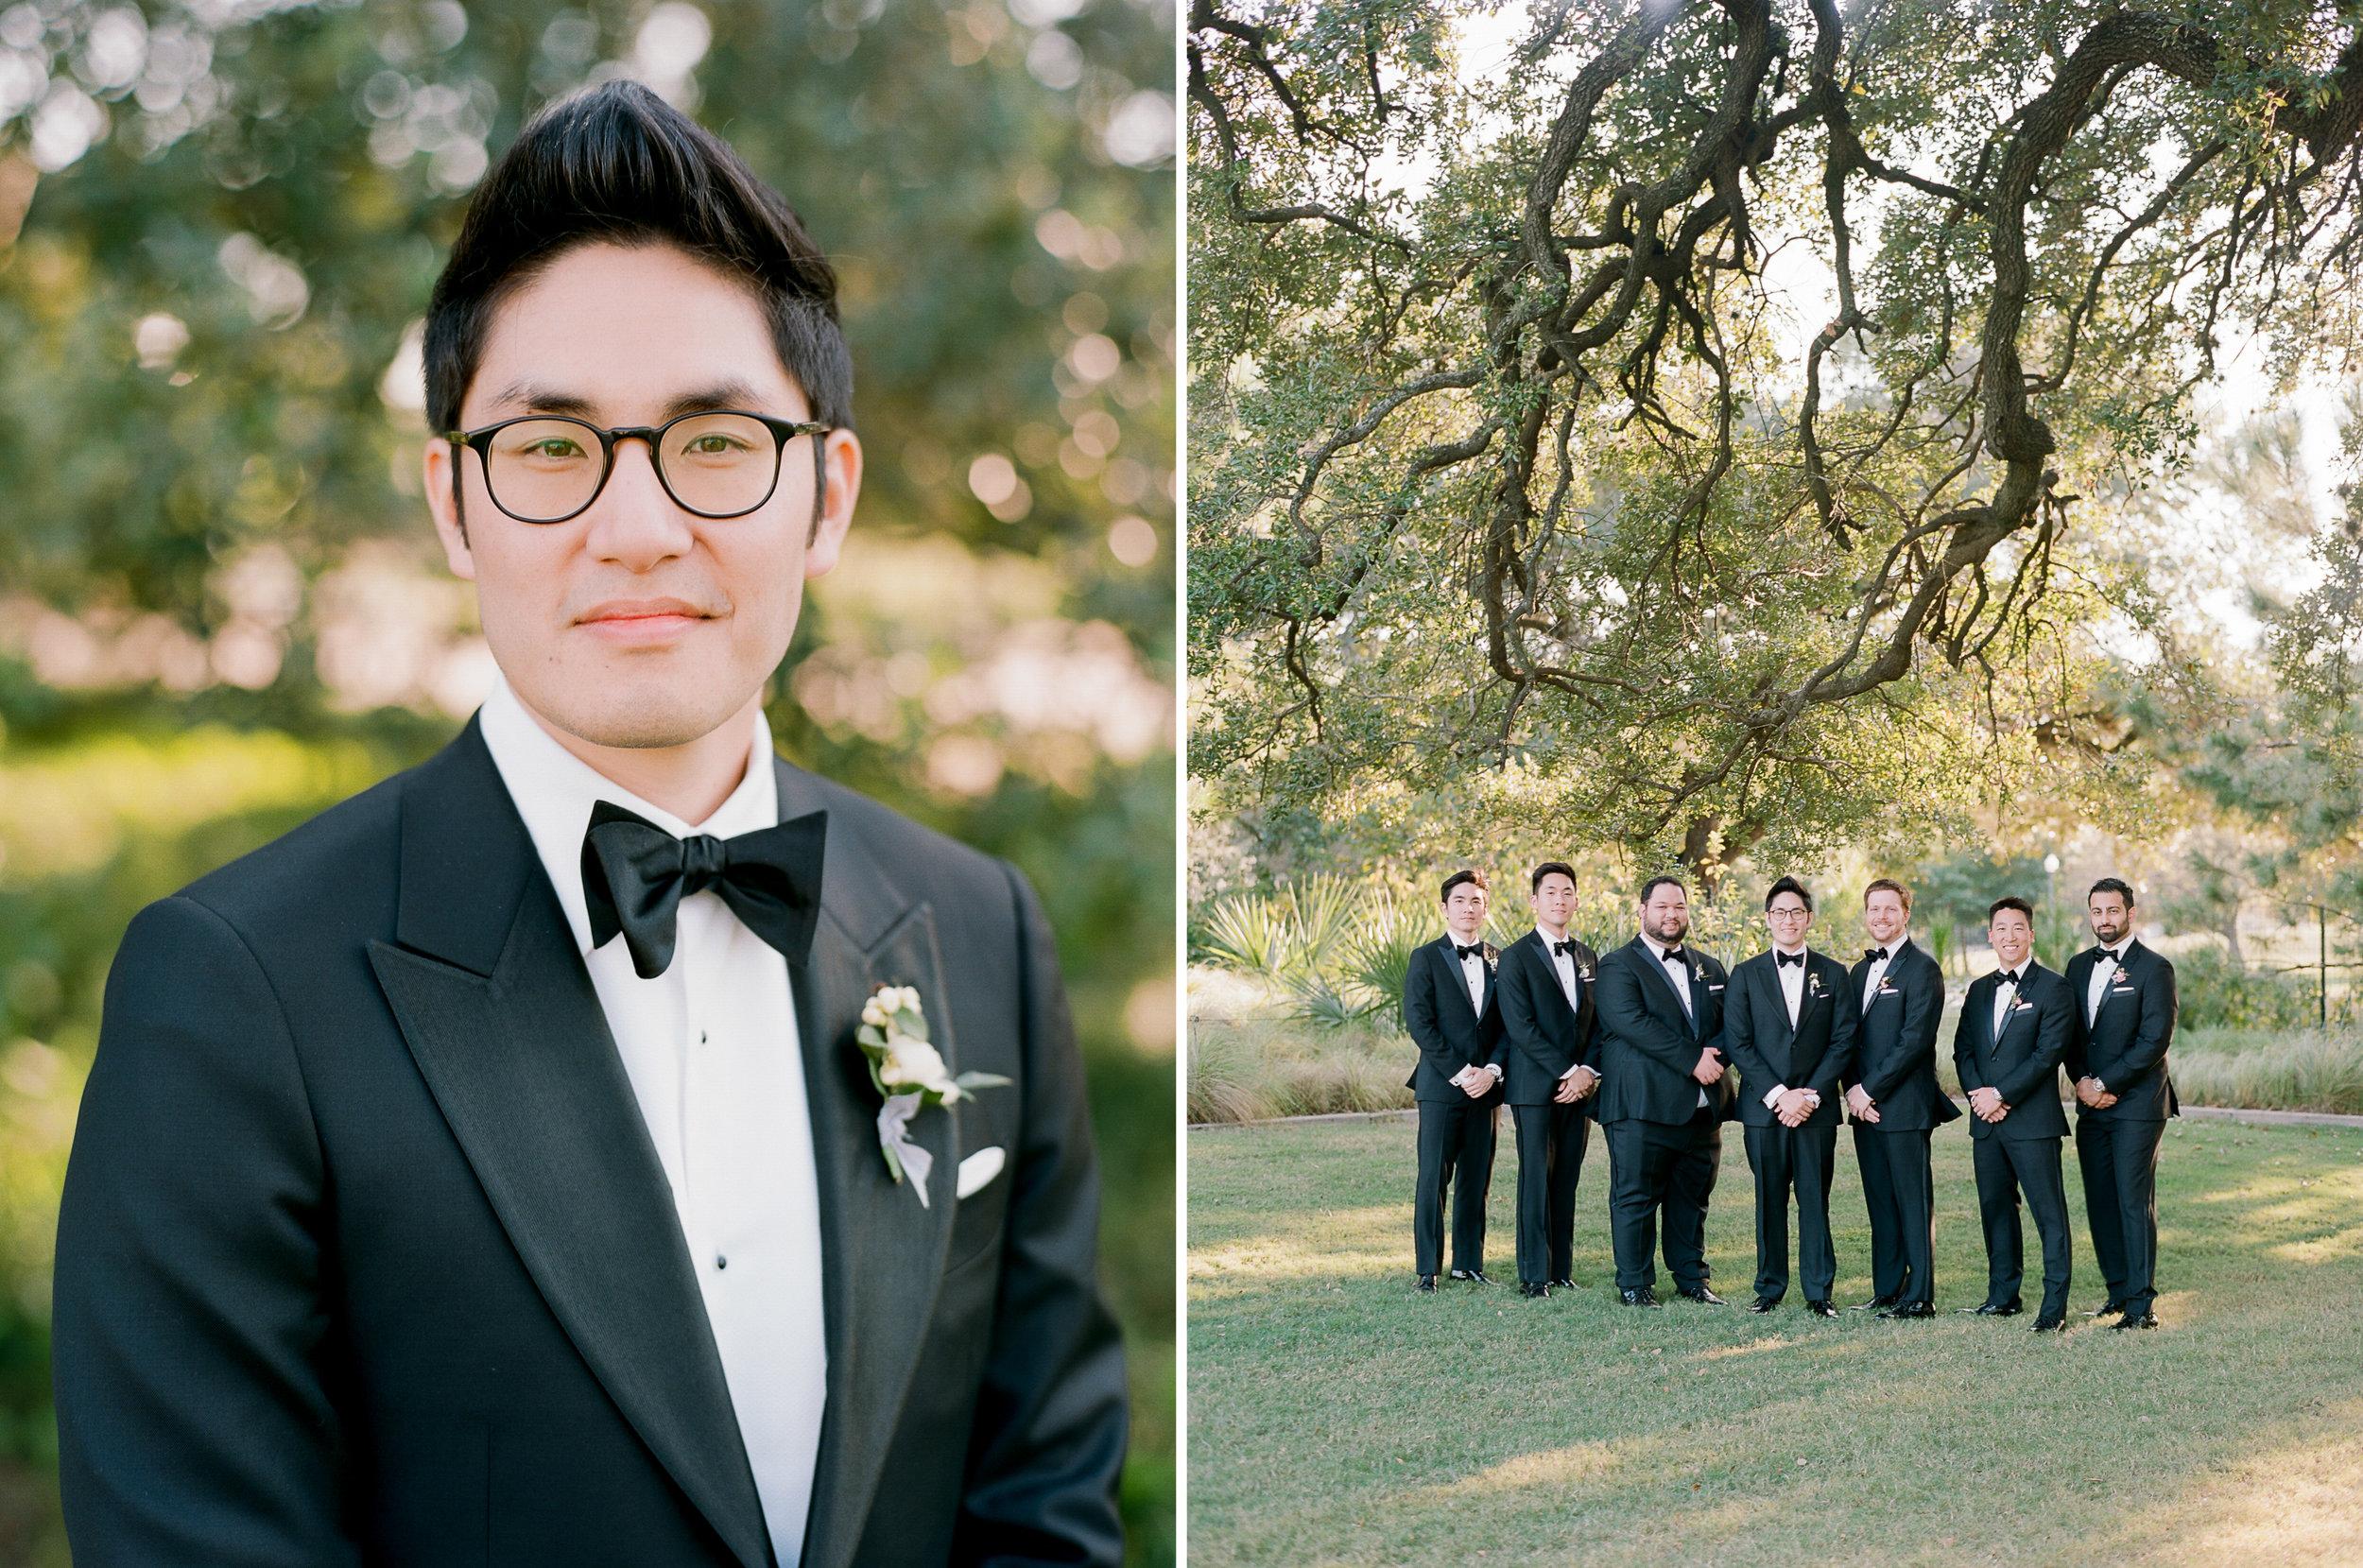 Martha-Stewart-Wedding-Dana-Fernandez-Photography-Josh-Texas-Film-Houston-Wedding-Fine-Art-Photographer-McGovern-Centennial-Gardens-Top-Best-112.jpg